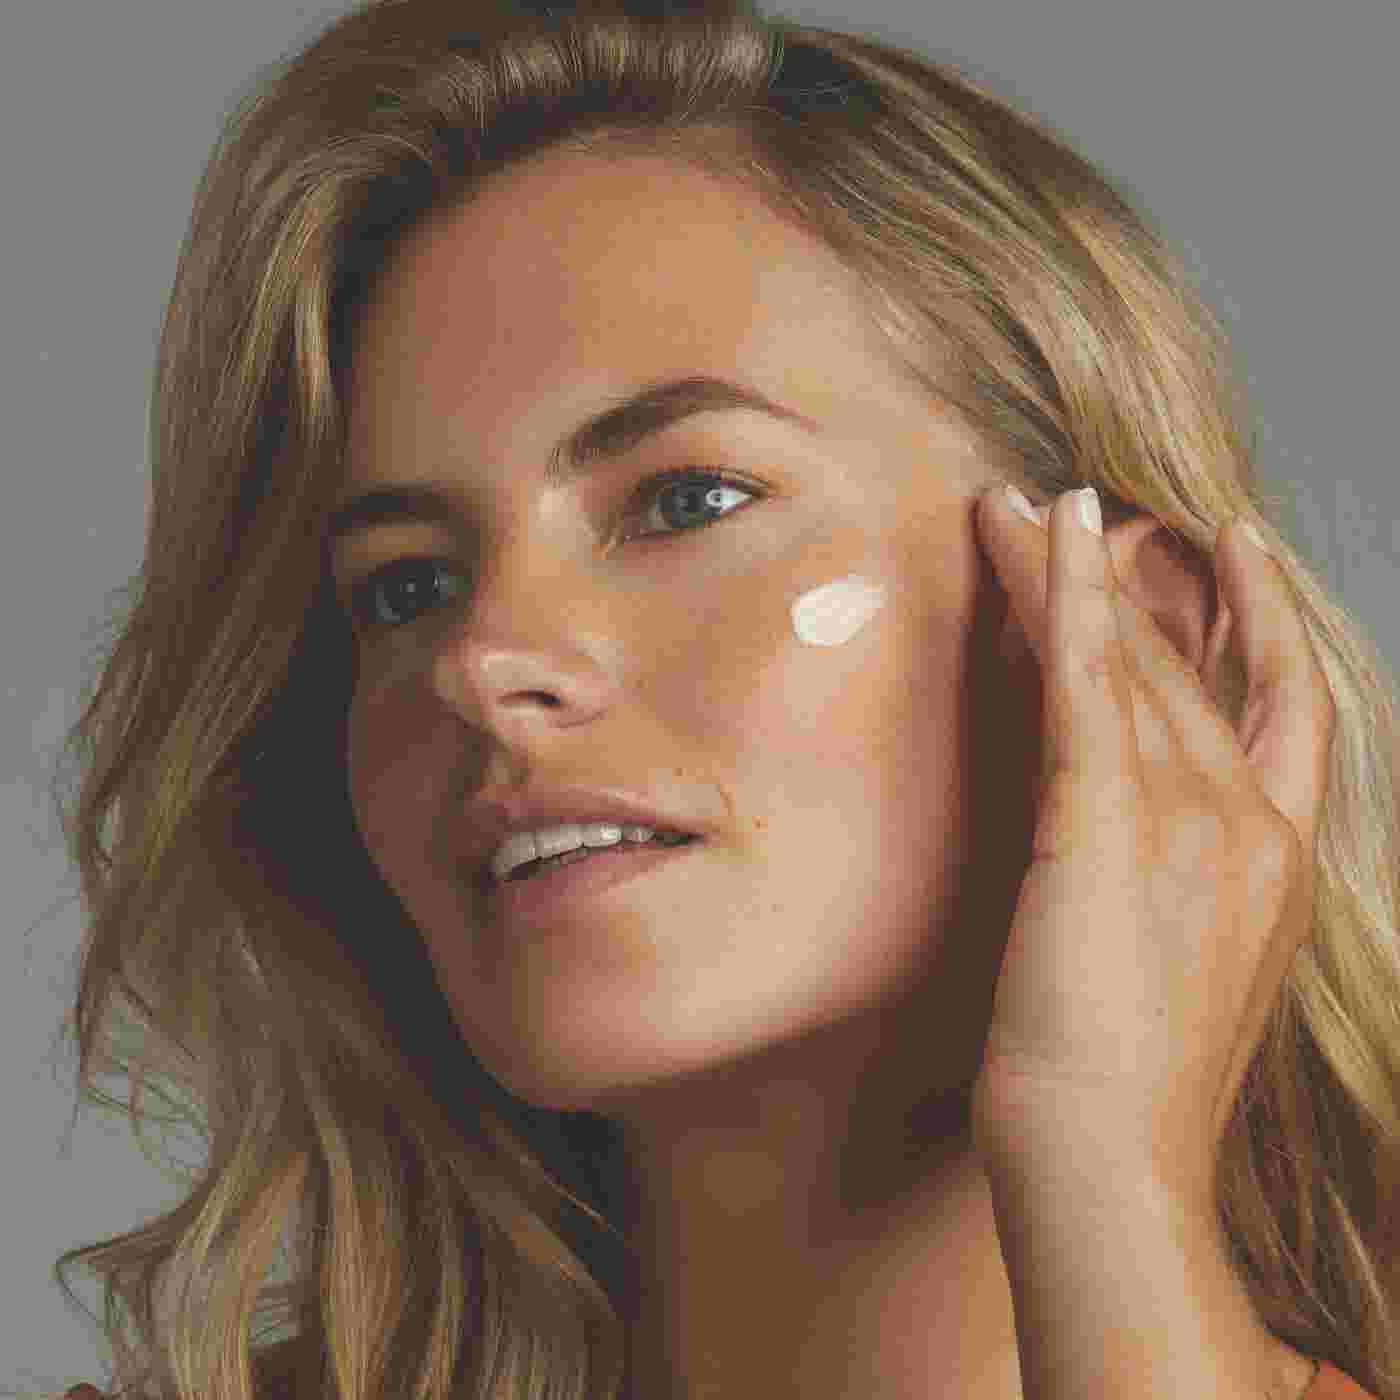 Model applying Max Factor Miracle Prep Illuminating & Hydrating Primer